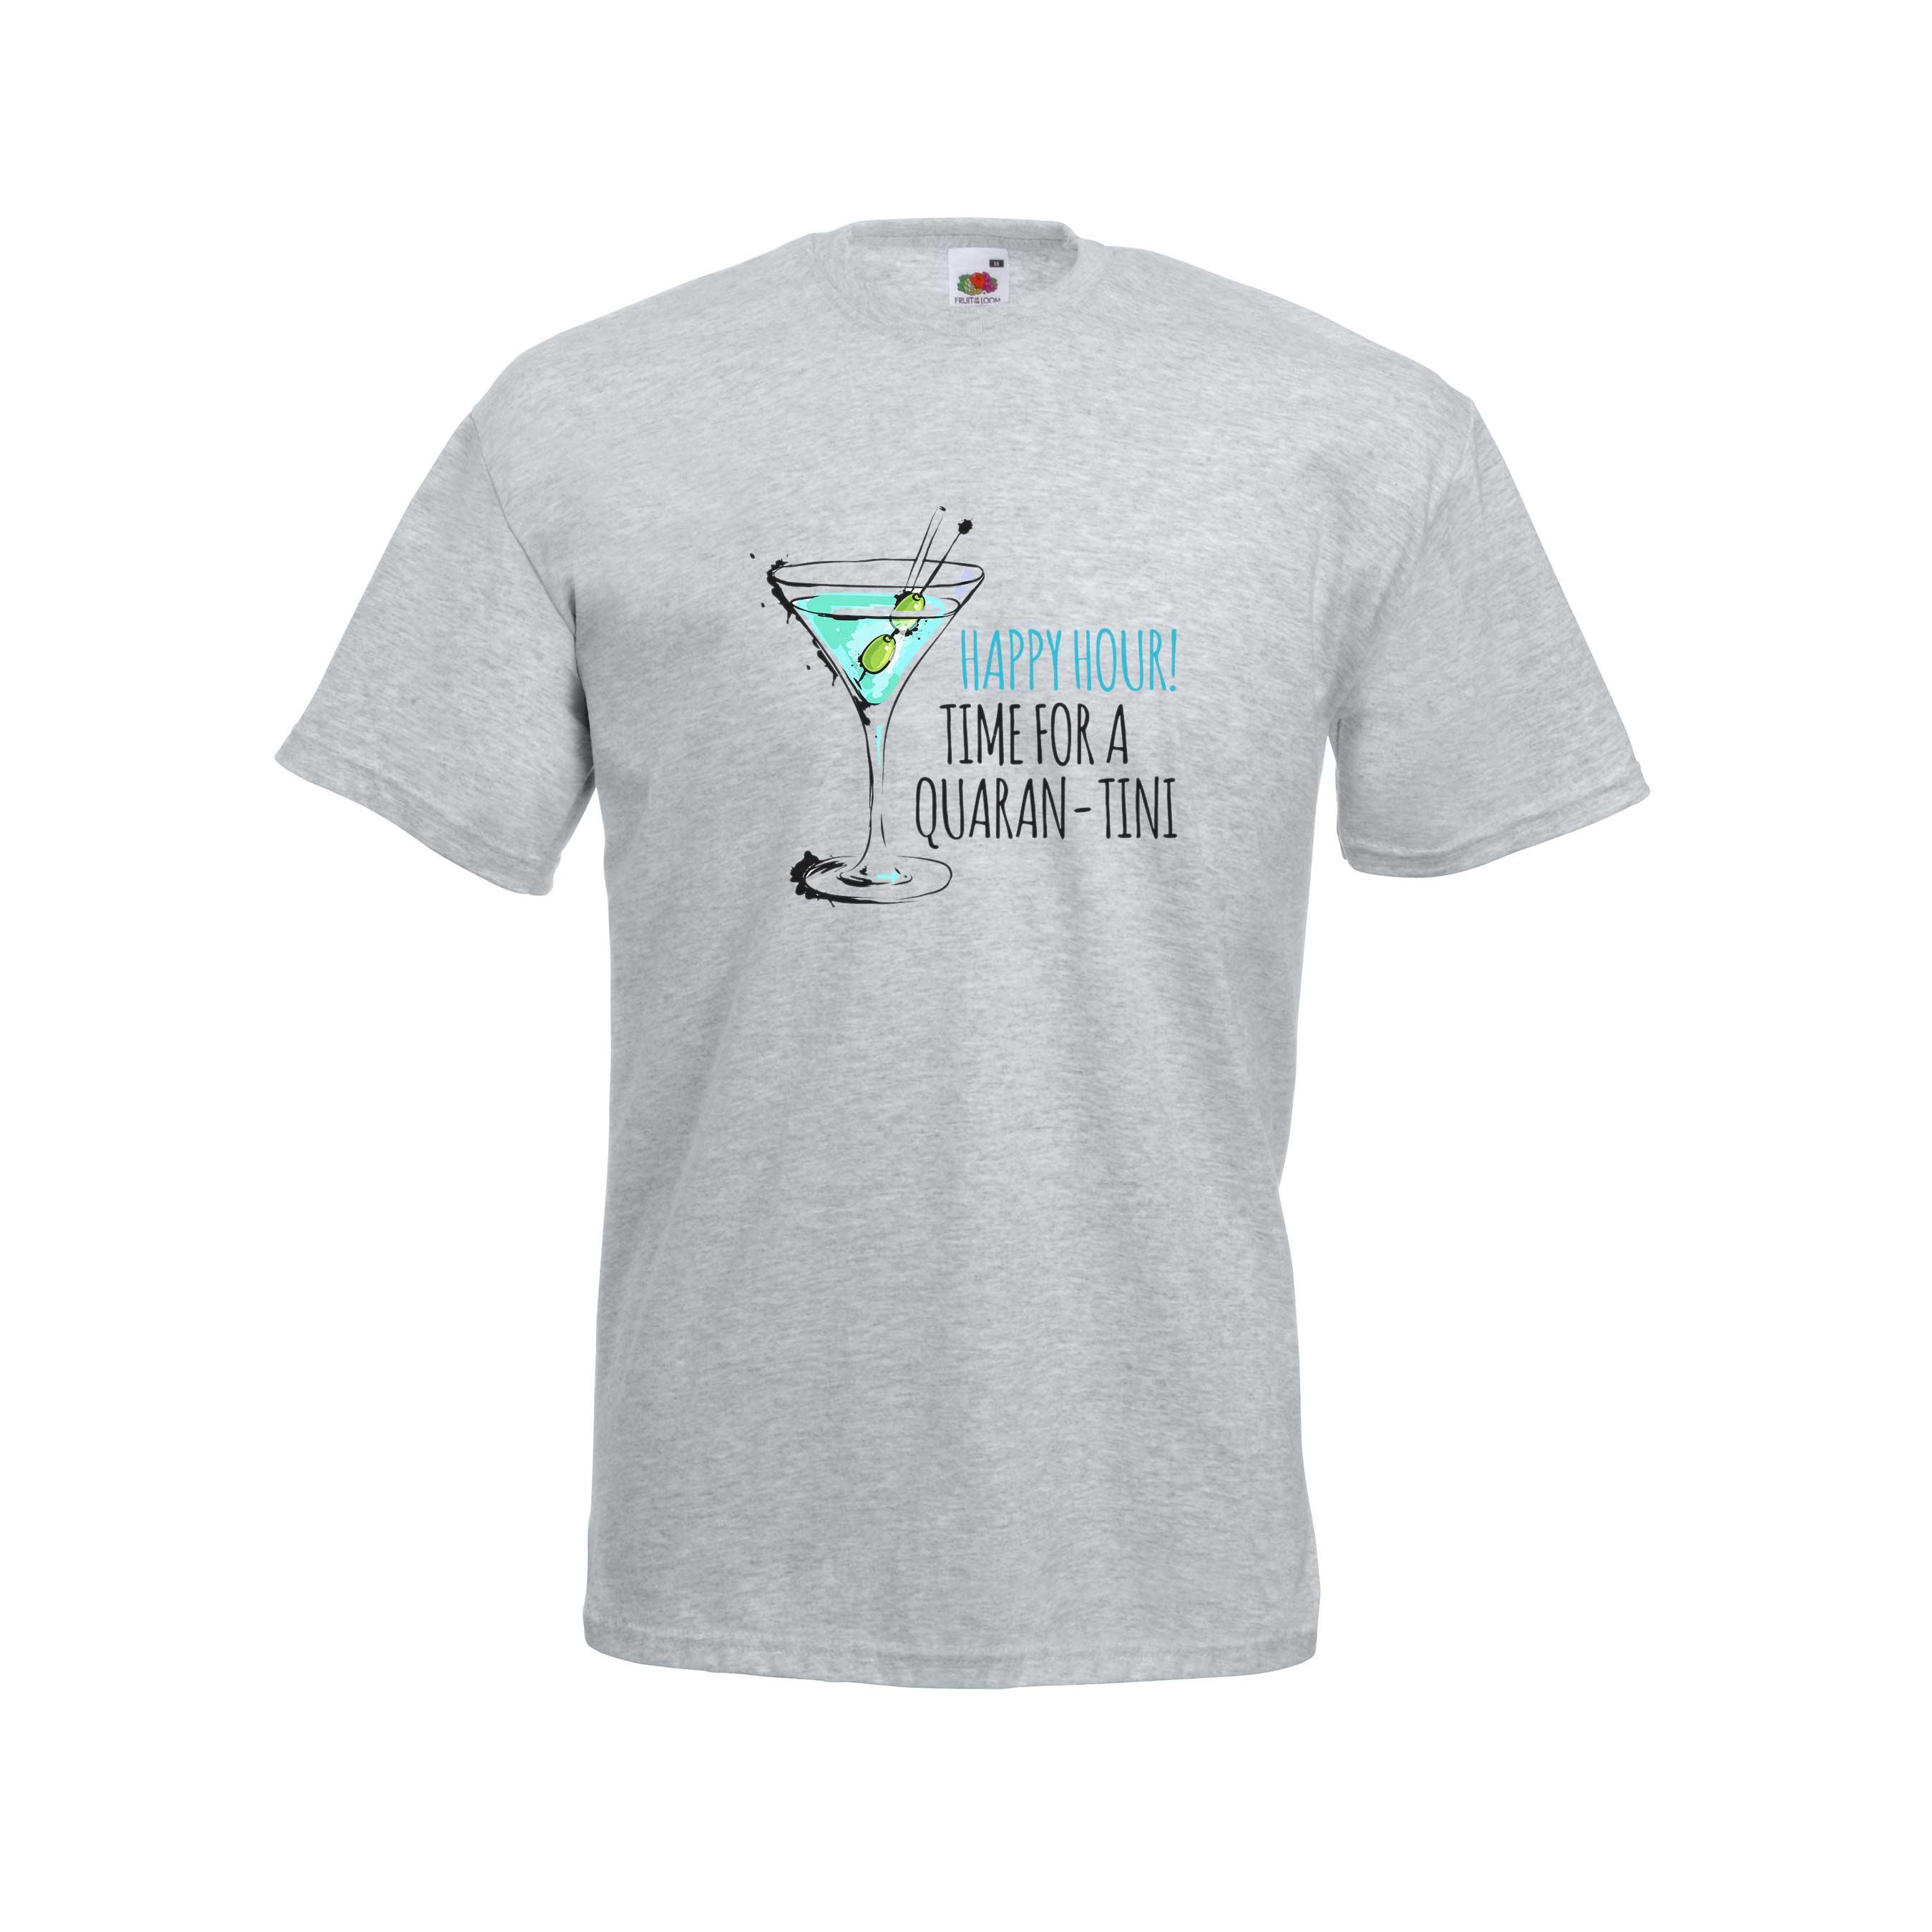 Quaran-tini design for t-shirt, hoodie & sweatshirt